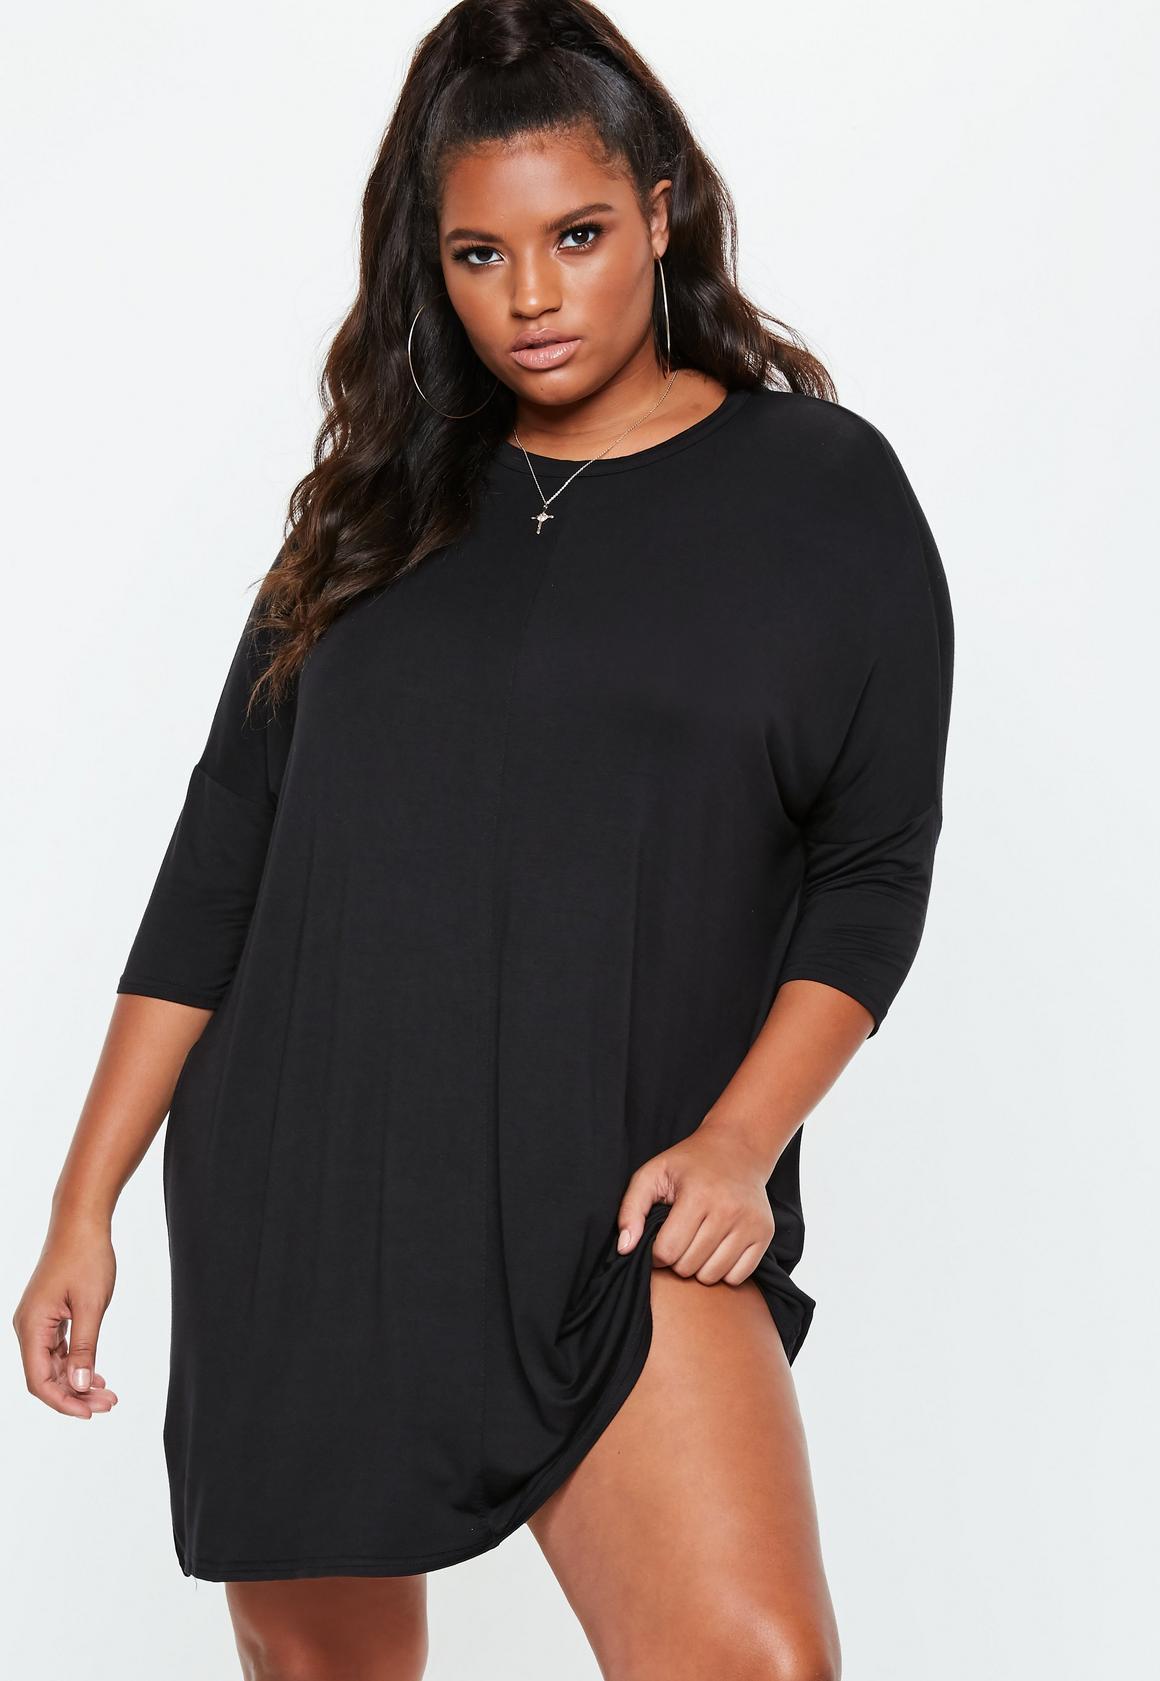 Black shirt dress - Curve Oversized T Shirt Dress Black Previous Next